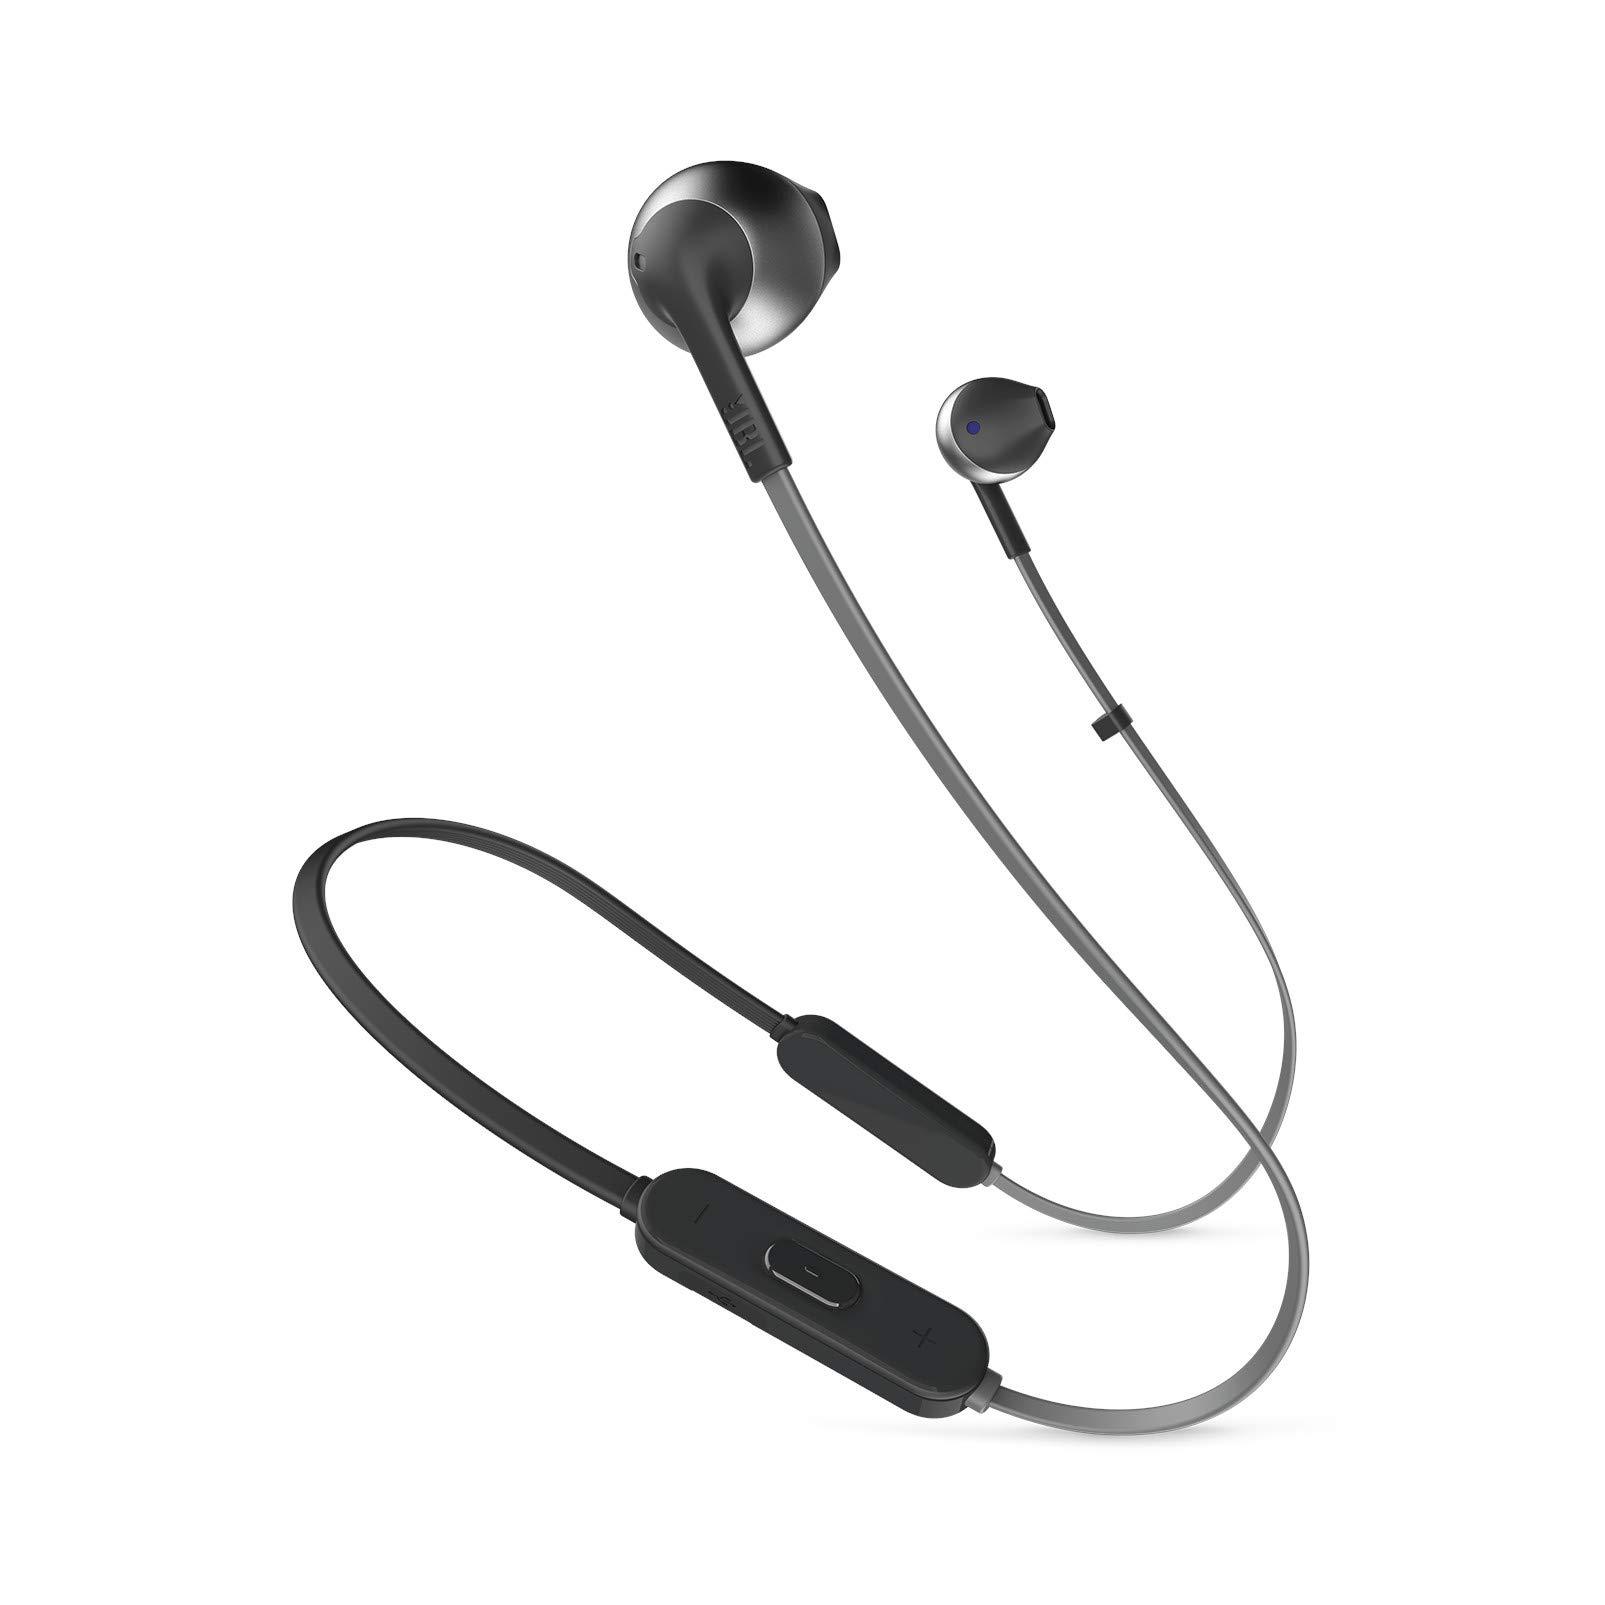 JBL Tune 205BT Wireless Earbud Headphones with Mic (Black)